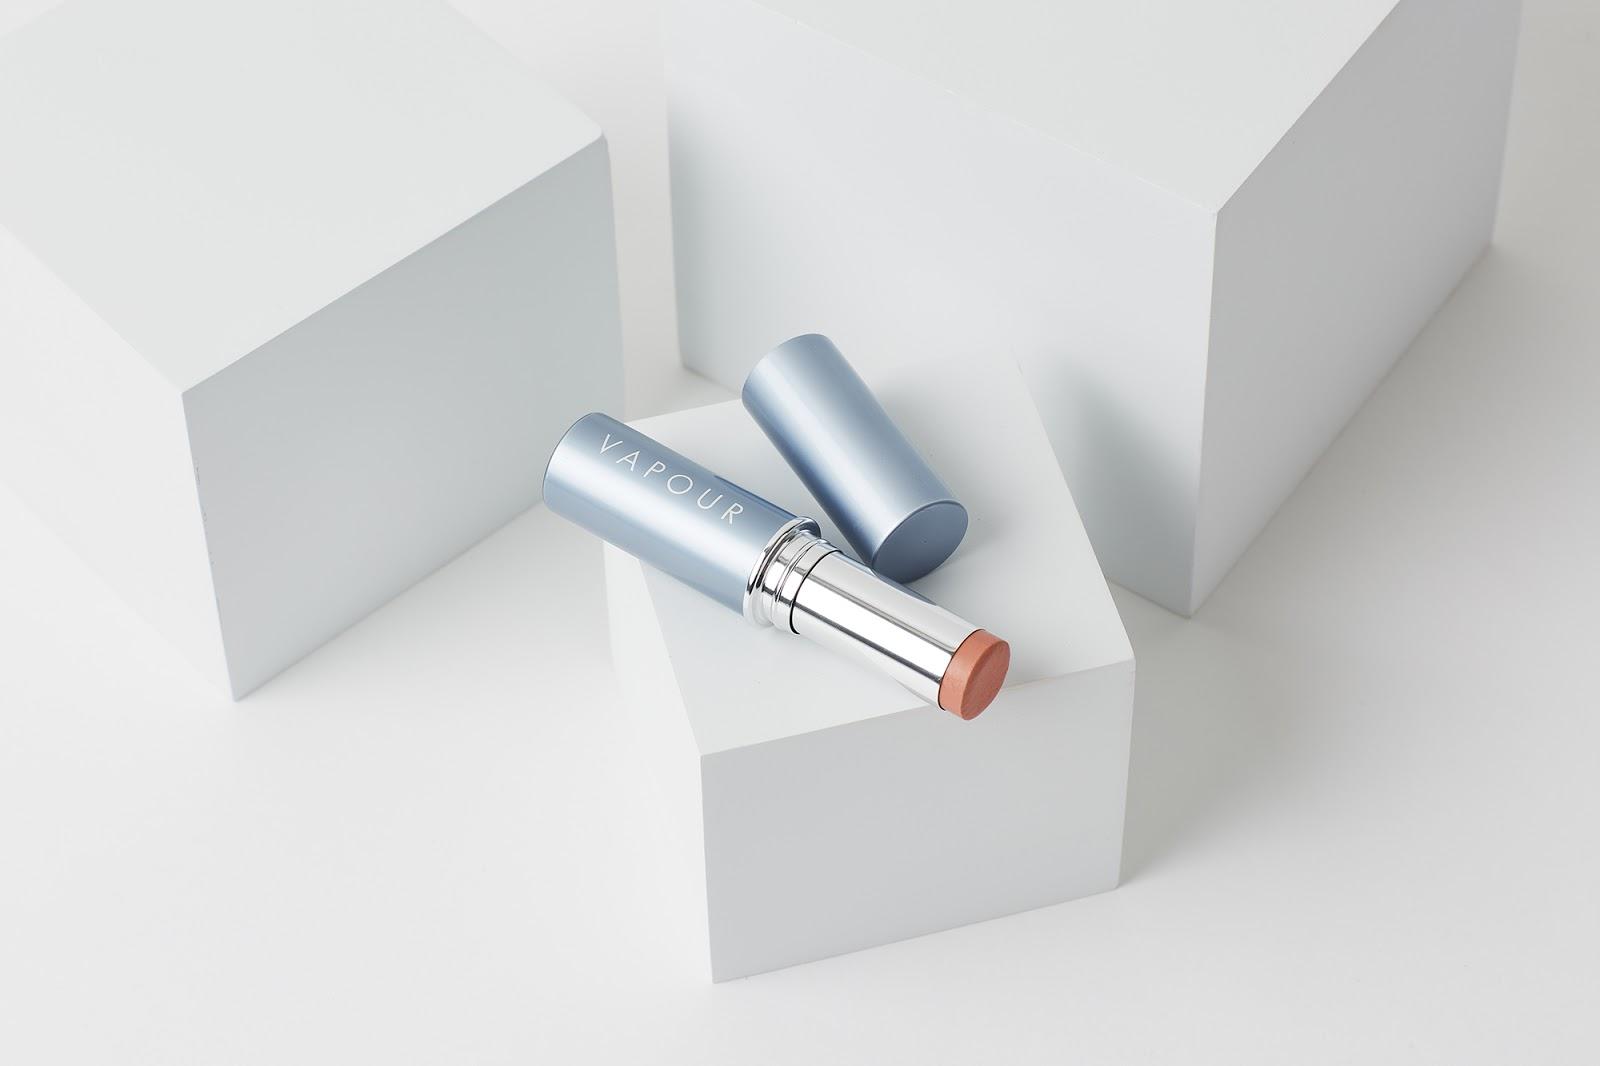 Vapour Organic Aura Multi-Use Blush in Spark review hellolindasau linda sau natural makeup brand